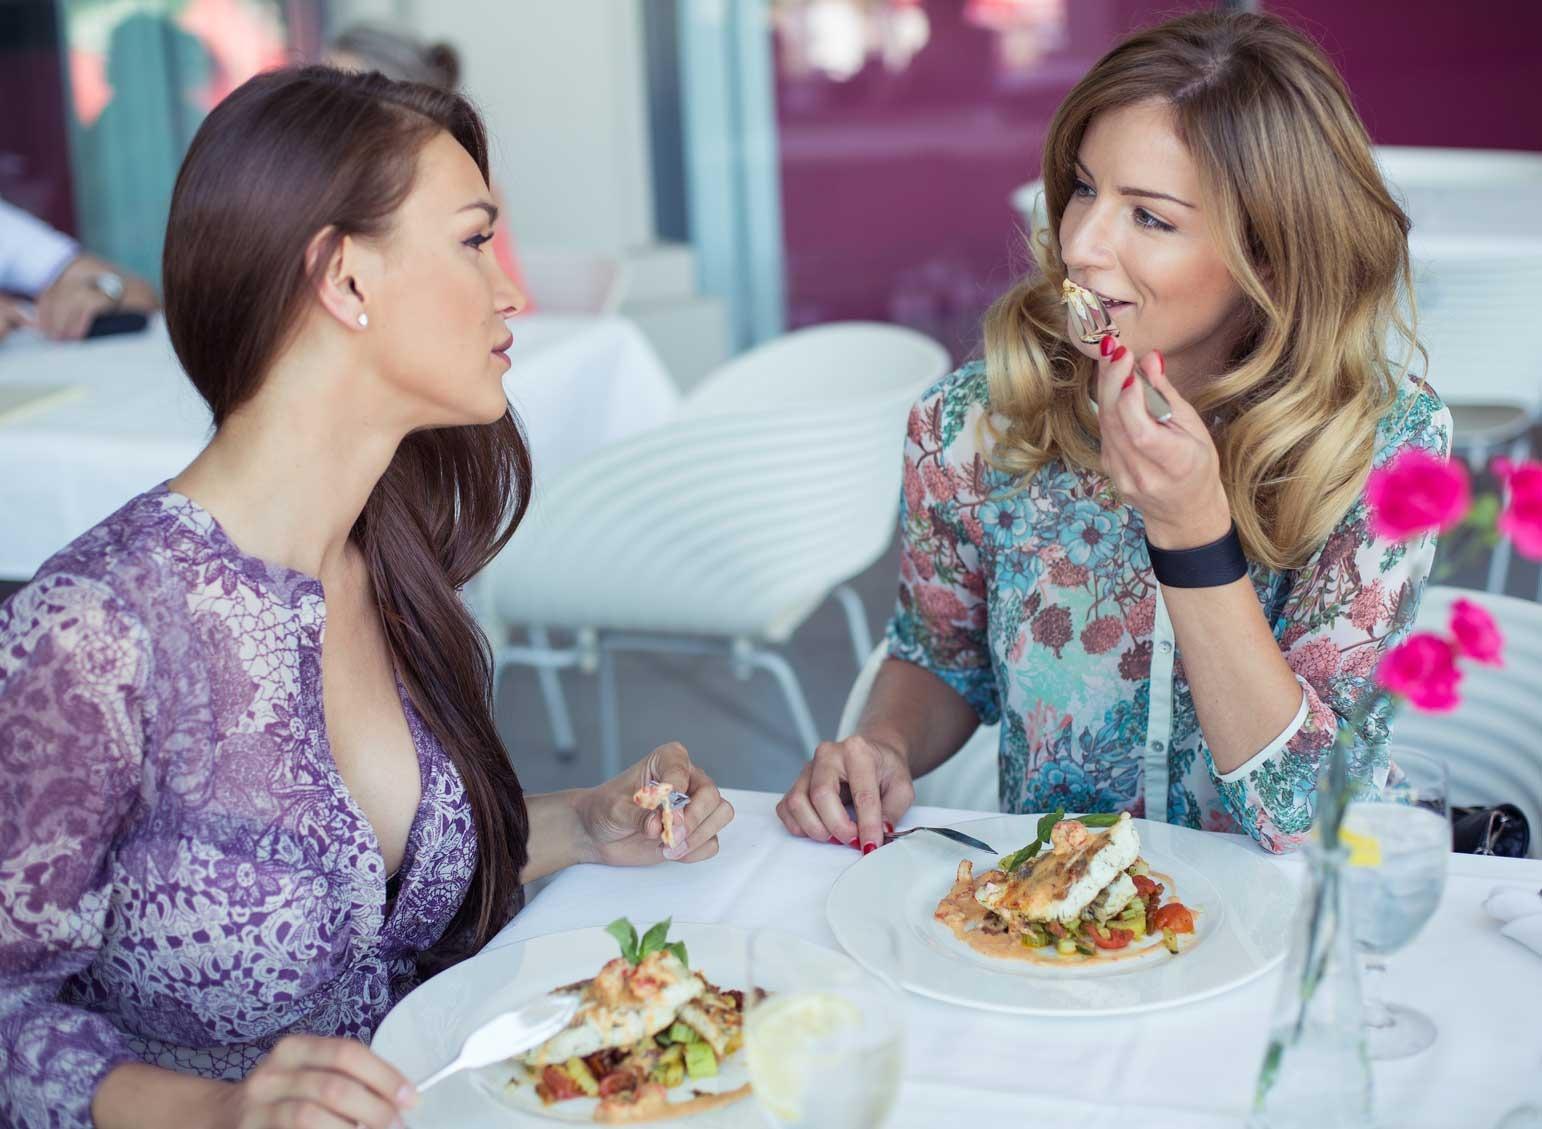 women eating lunch